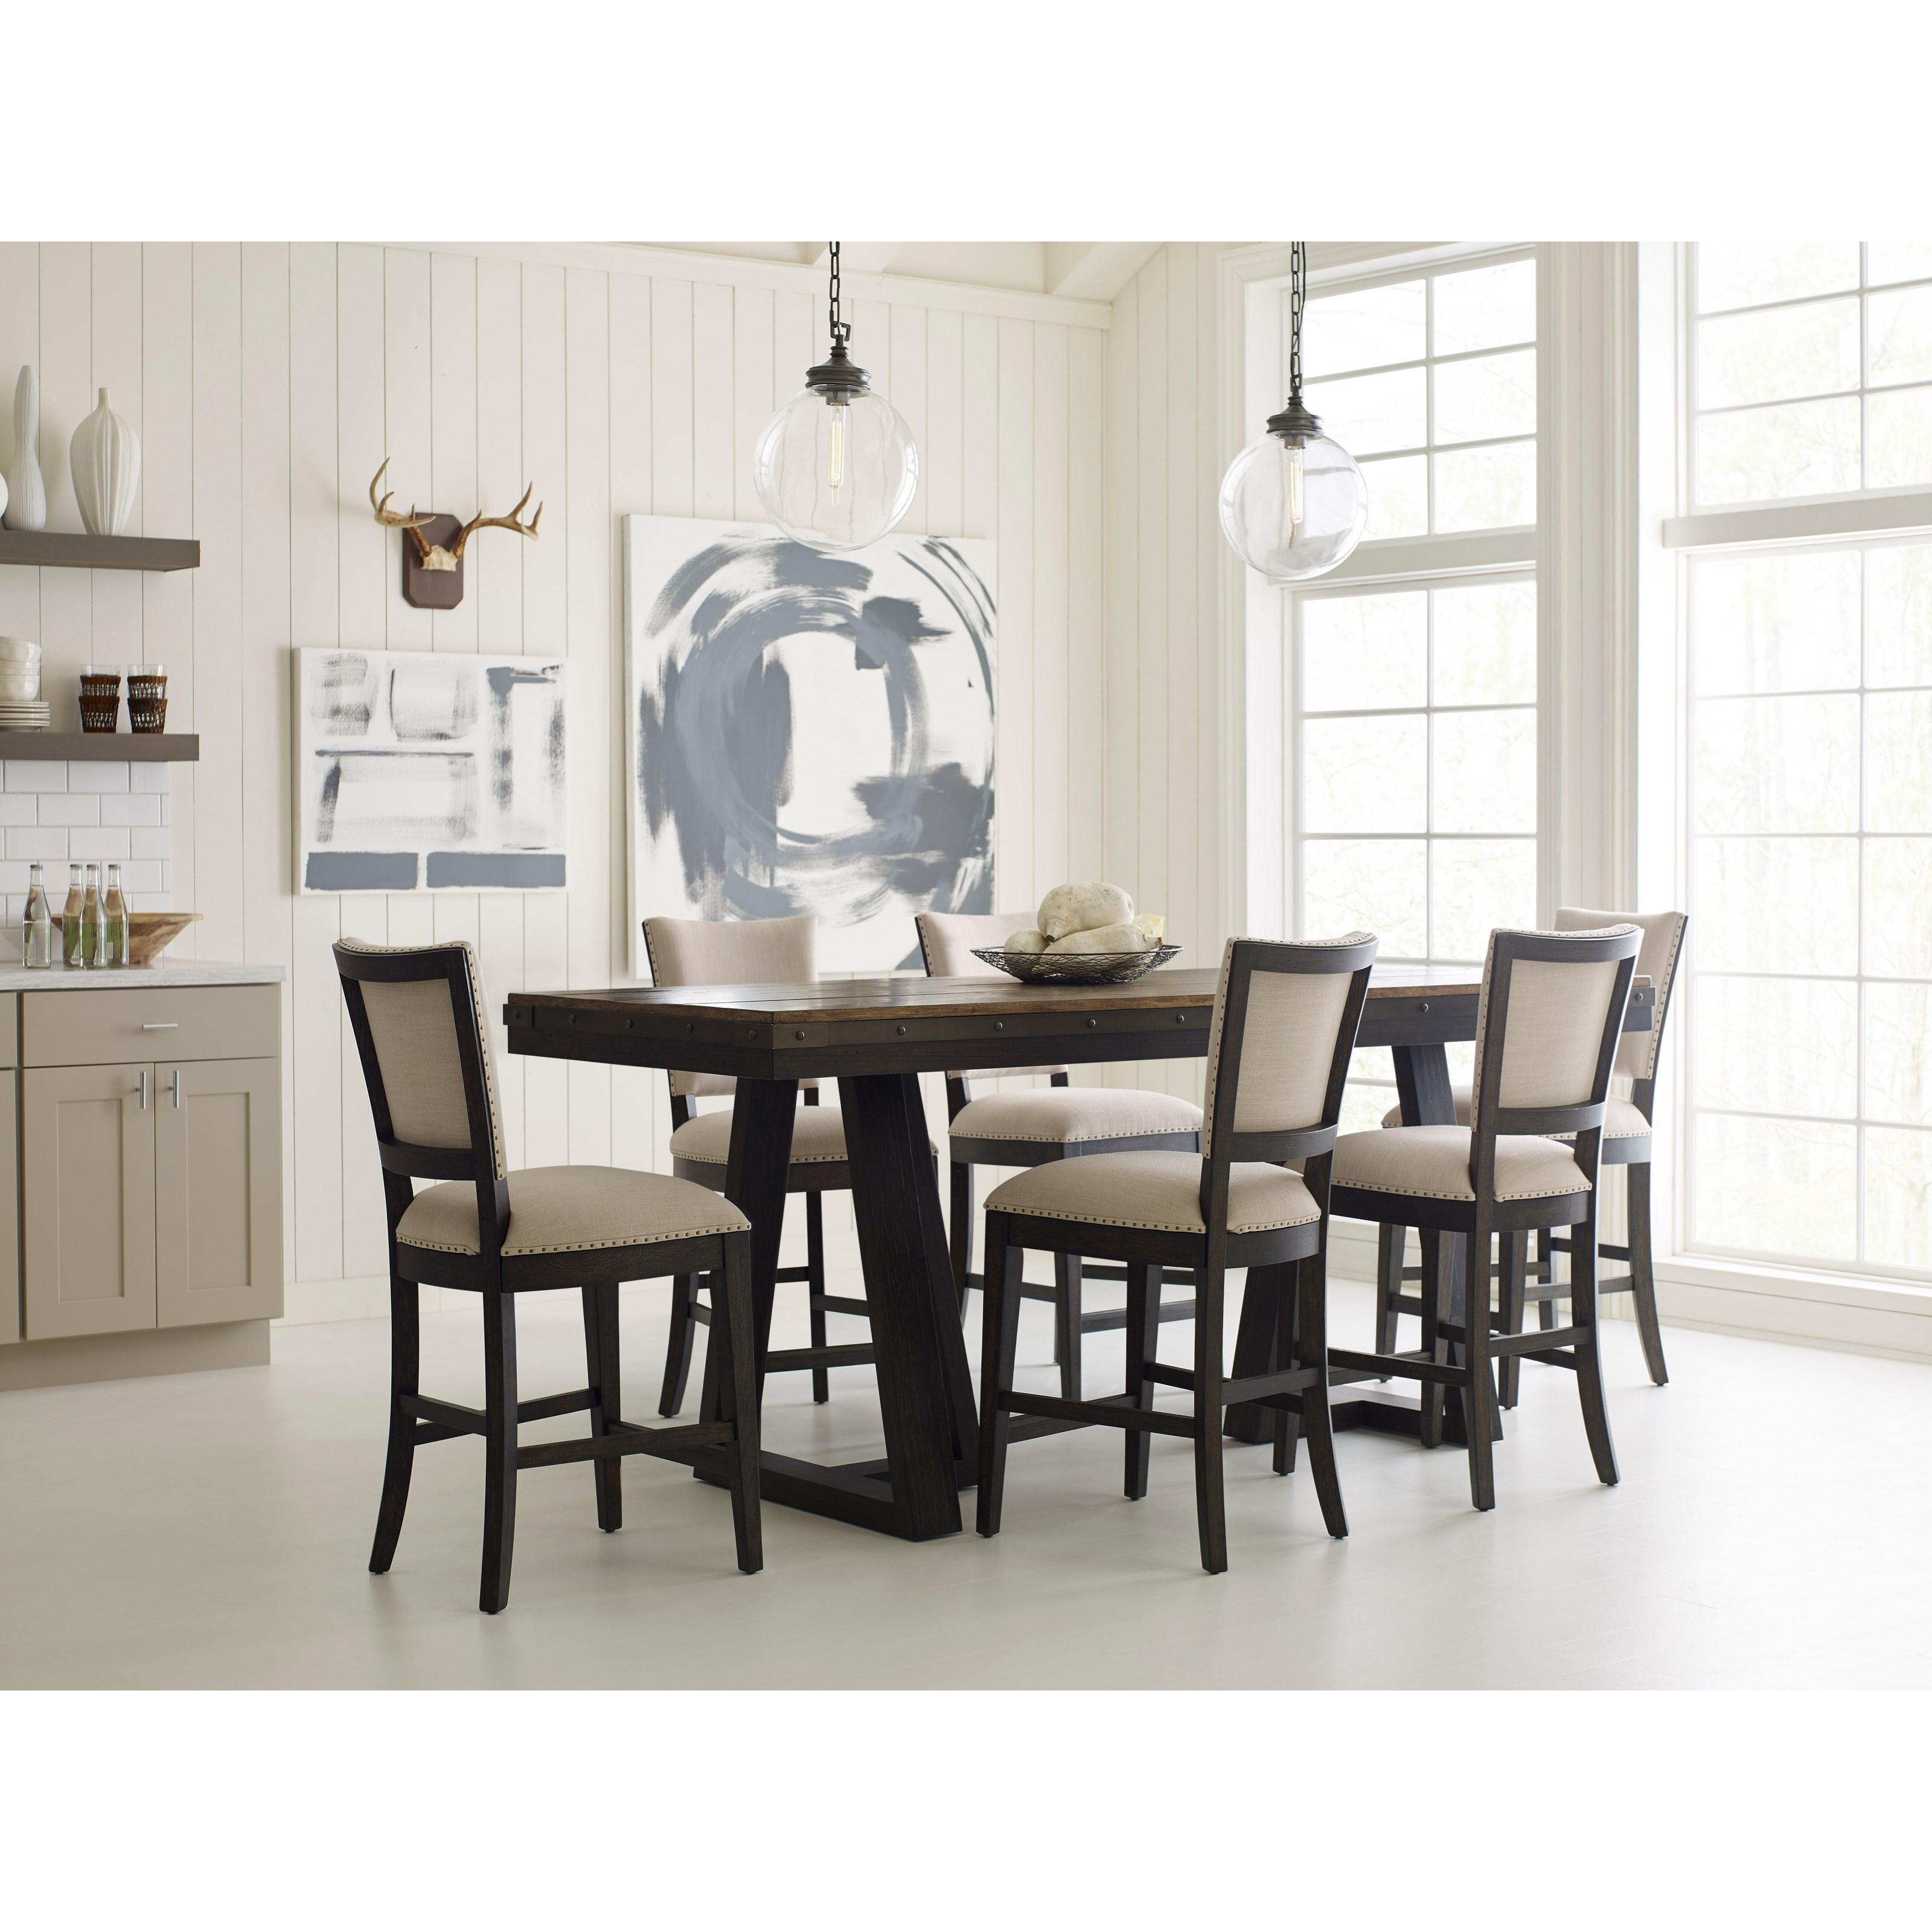 ... Kincaid Furniture Plank RoadKimler Counter Height Dining Table ...